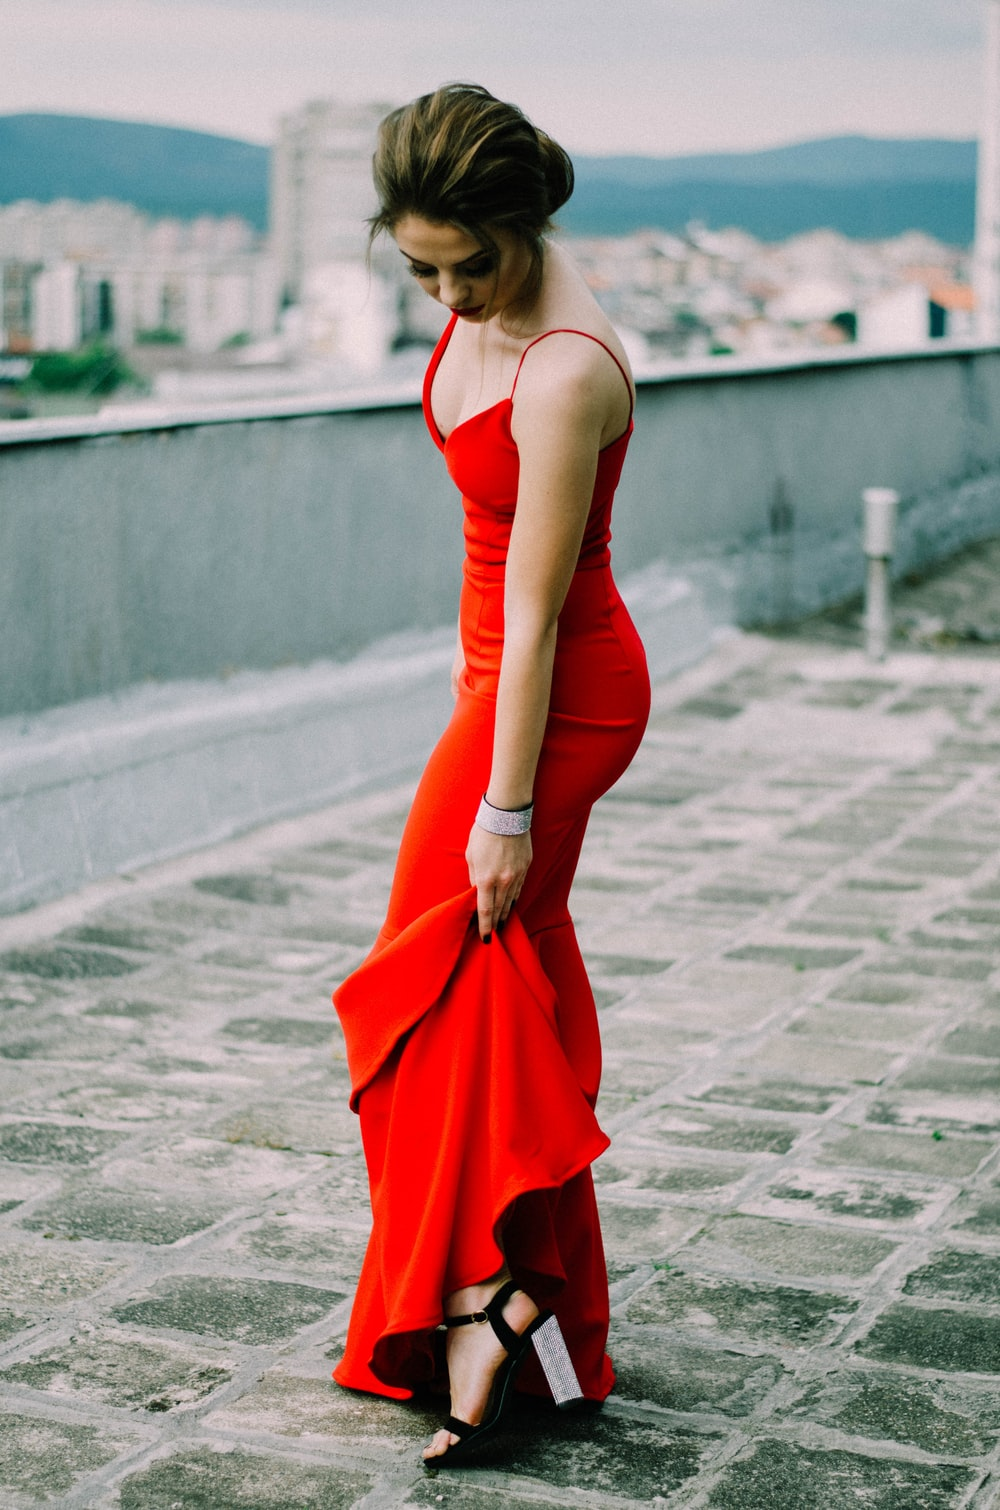 woman wearing red spaghetti strap dress